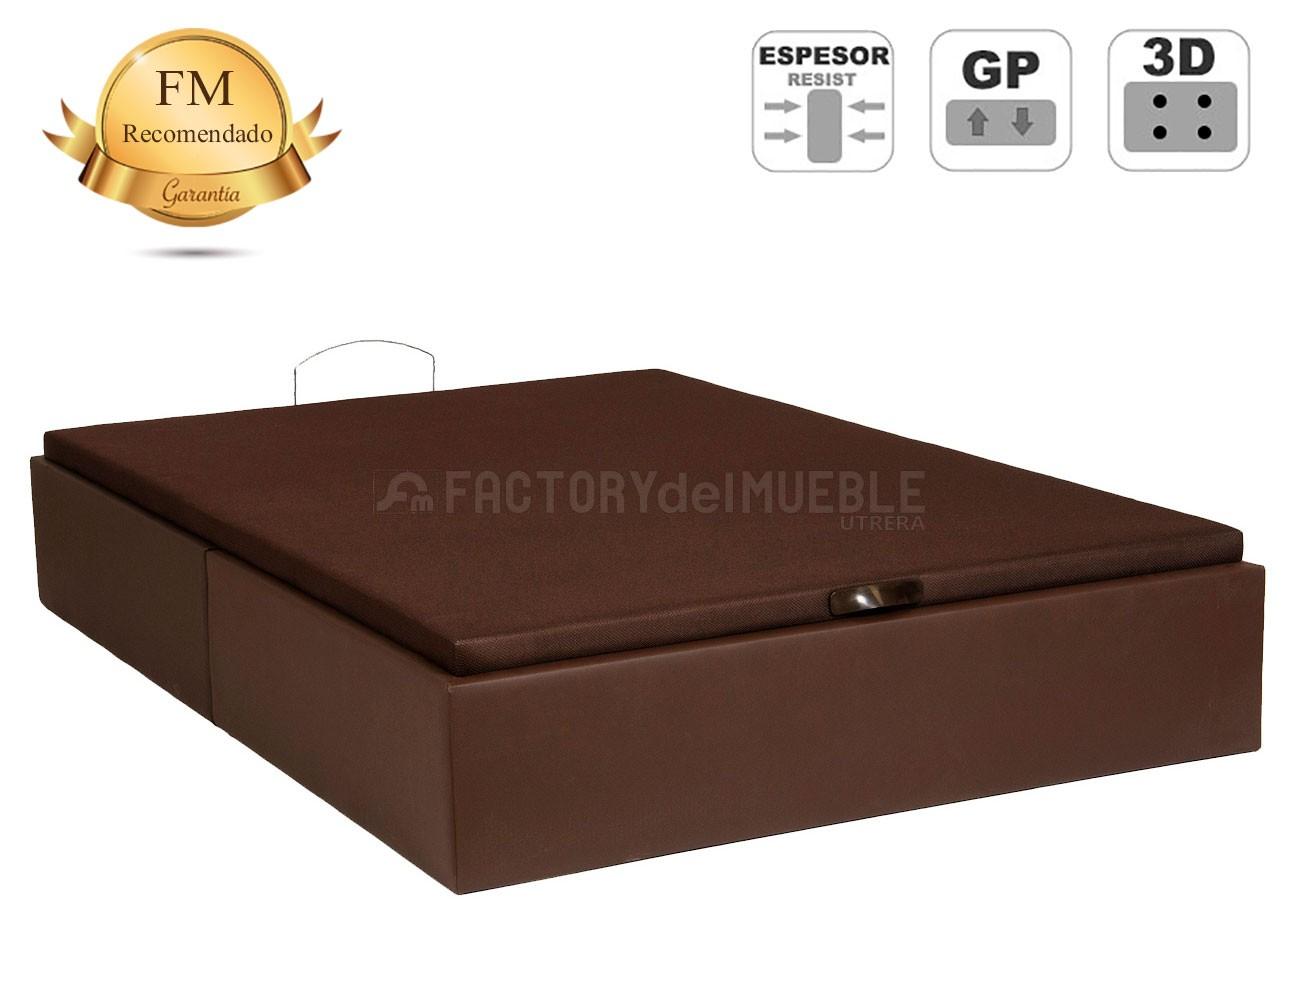 Canape polipiel chocolate recto